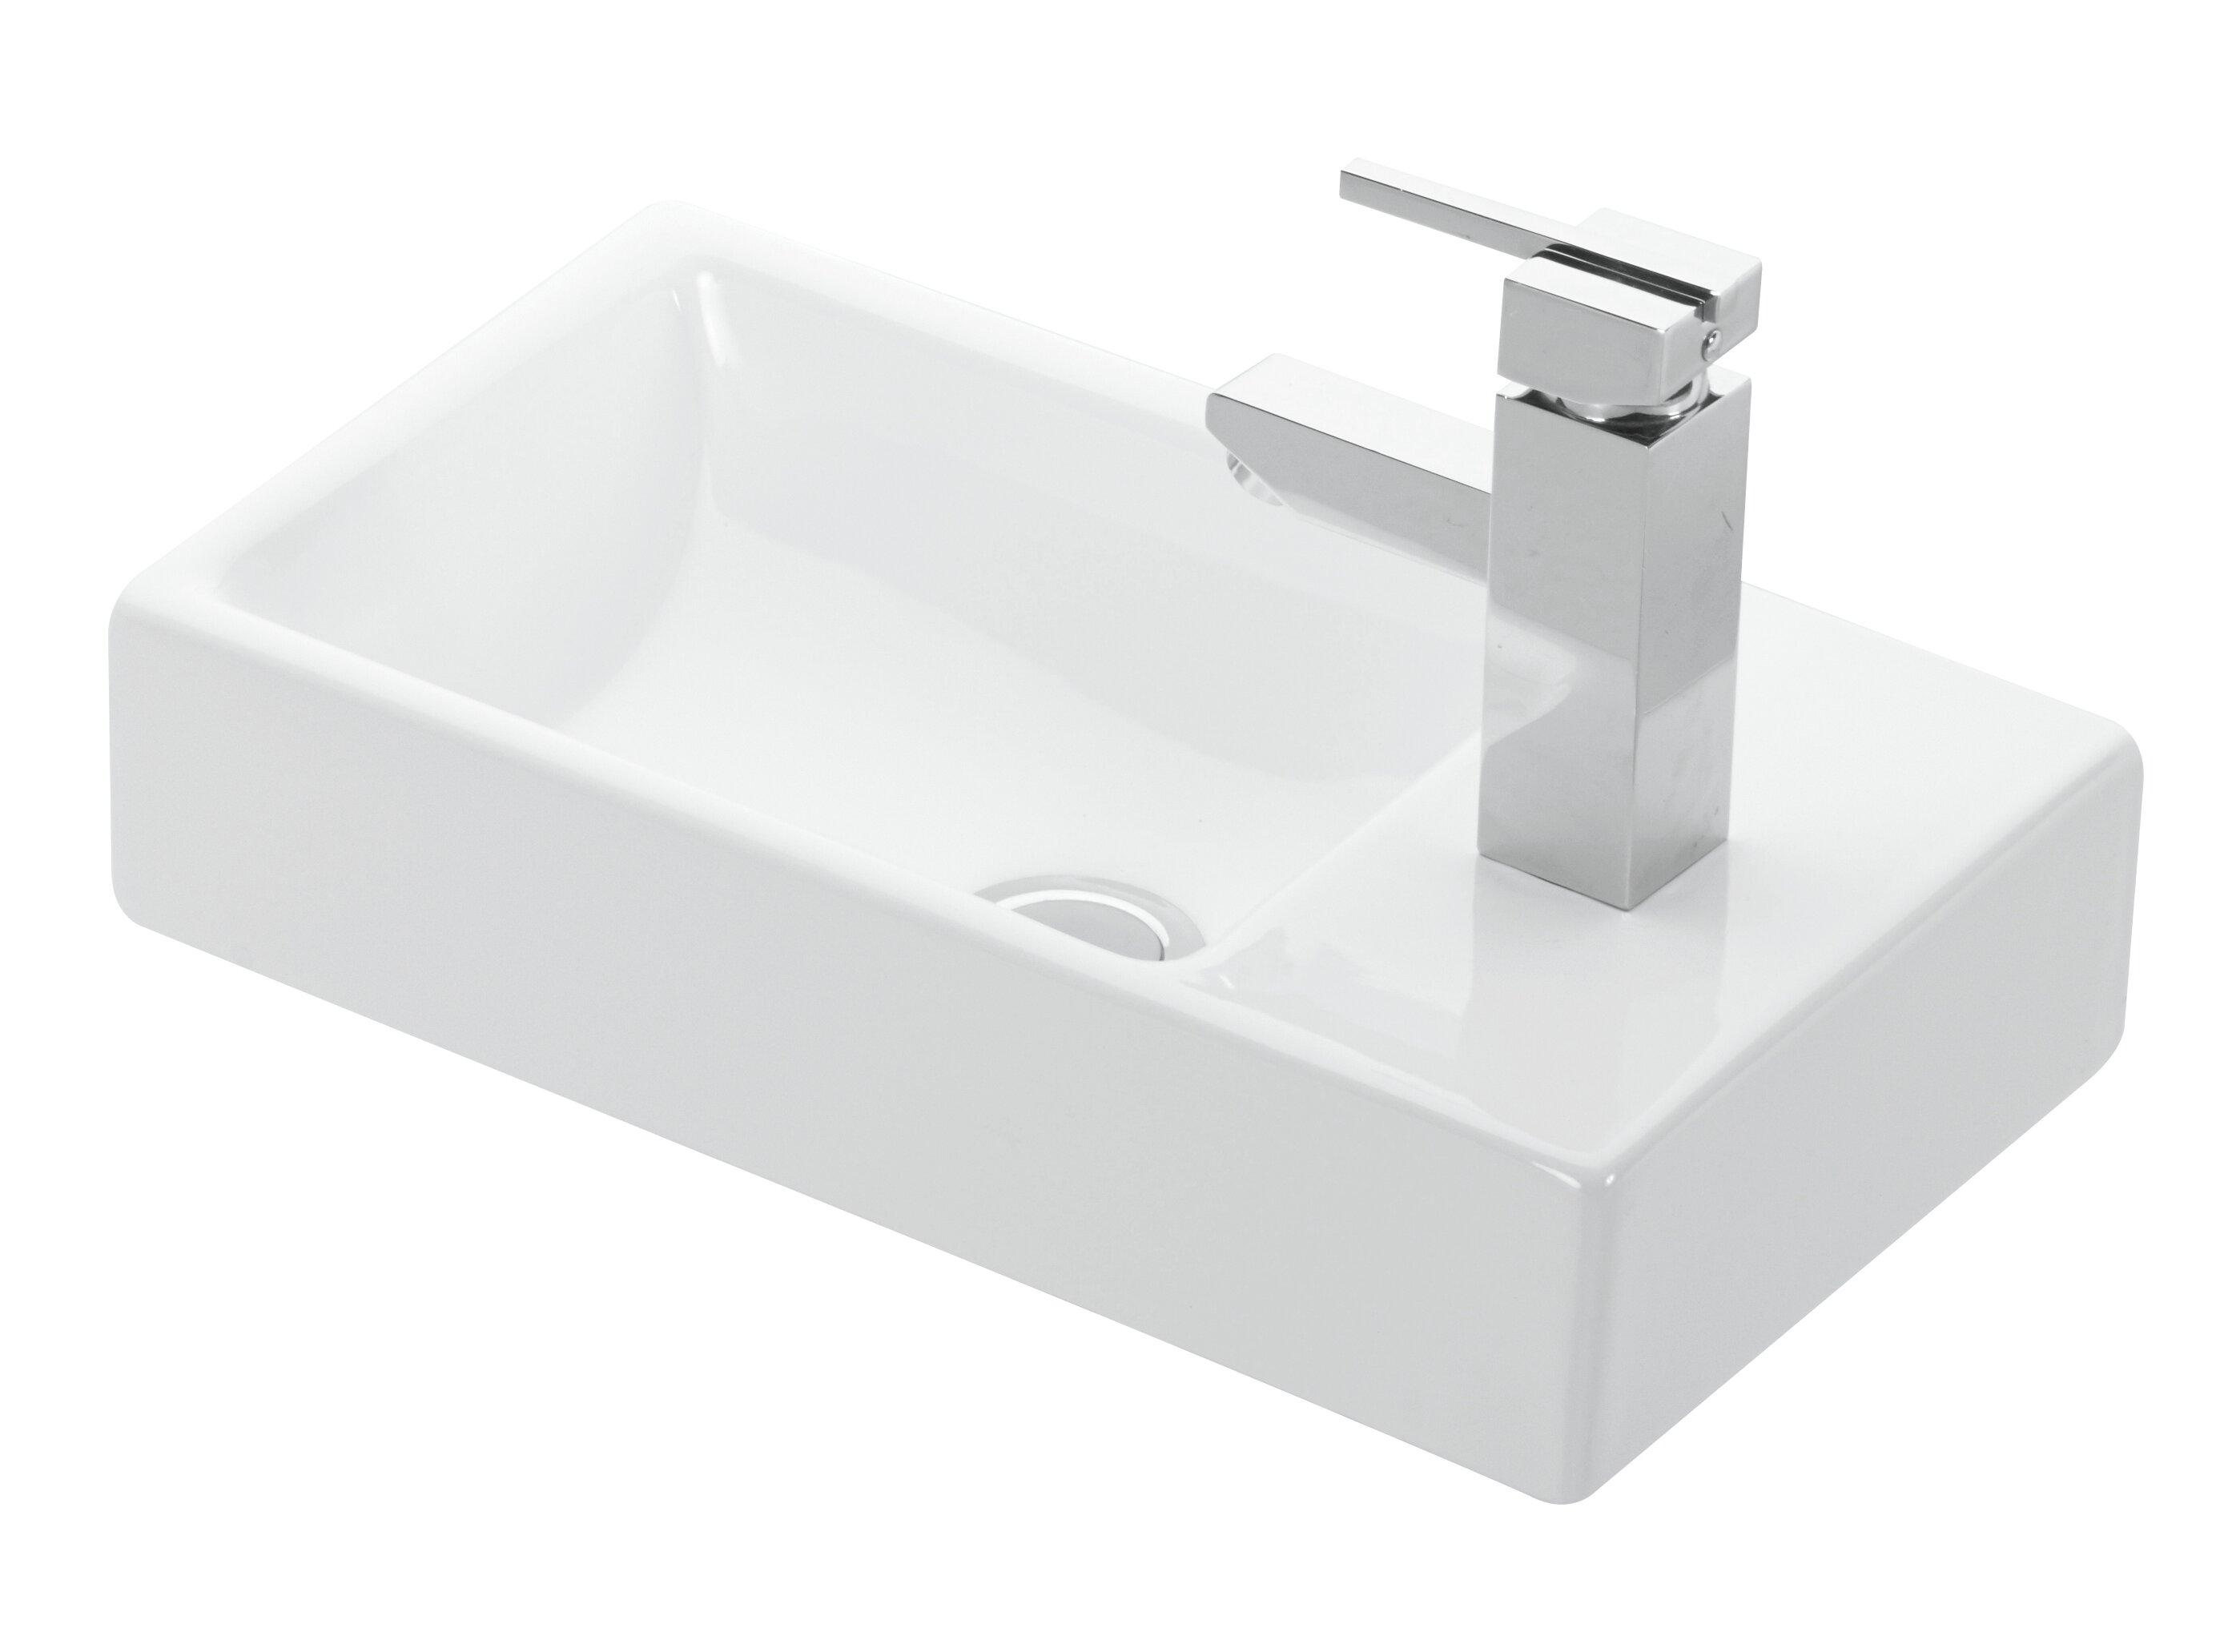 Vessel Ws Bath Collections Bathroom Sinks You Ll Love In 2021 Wayfair